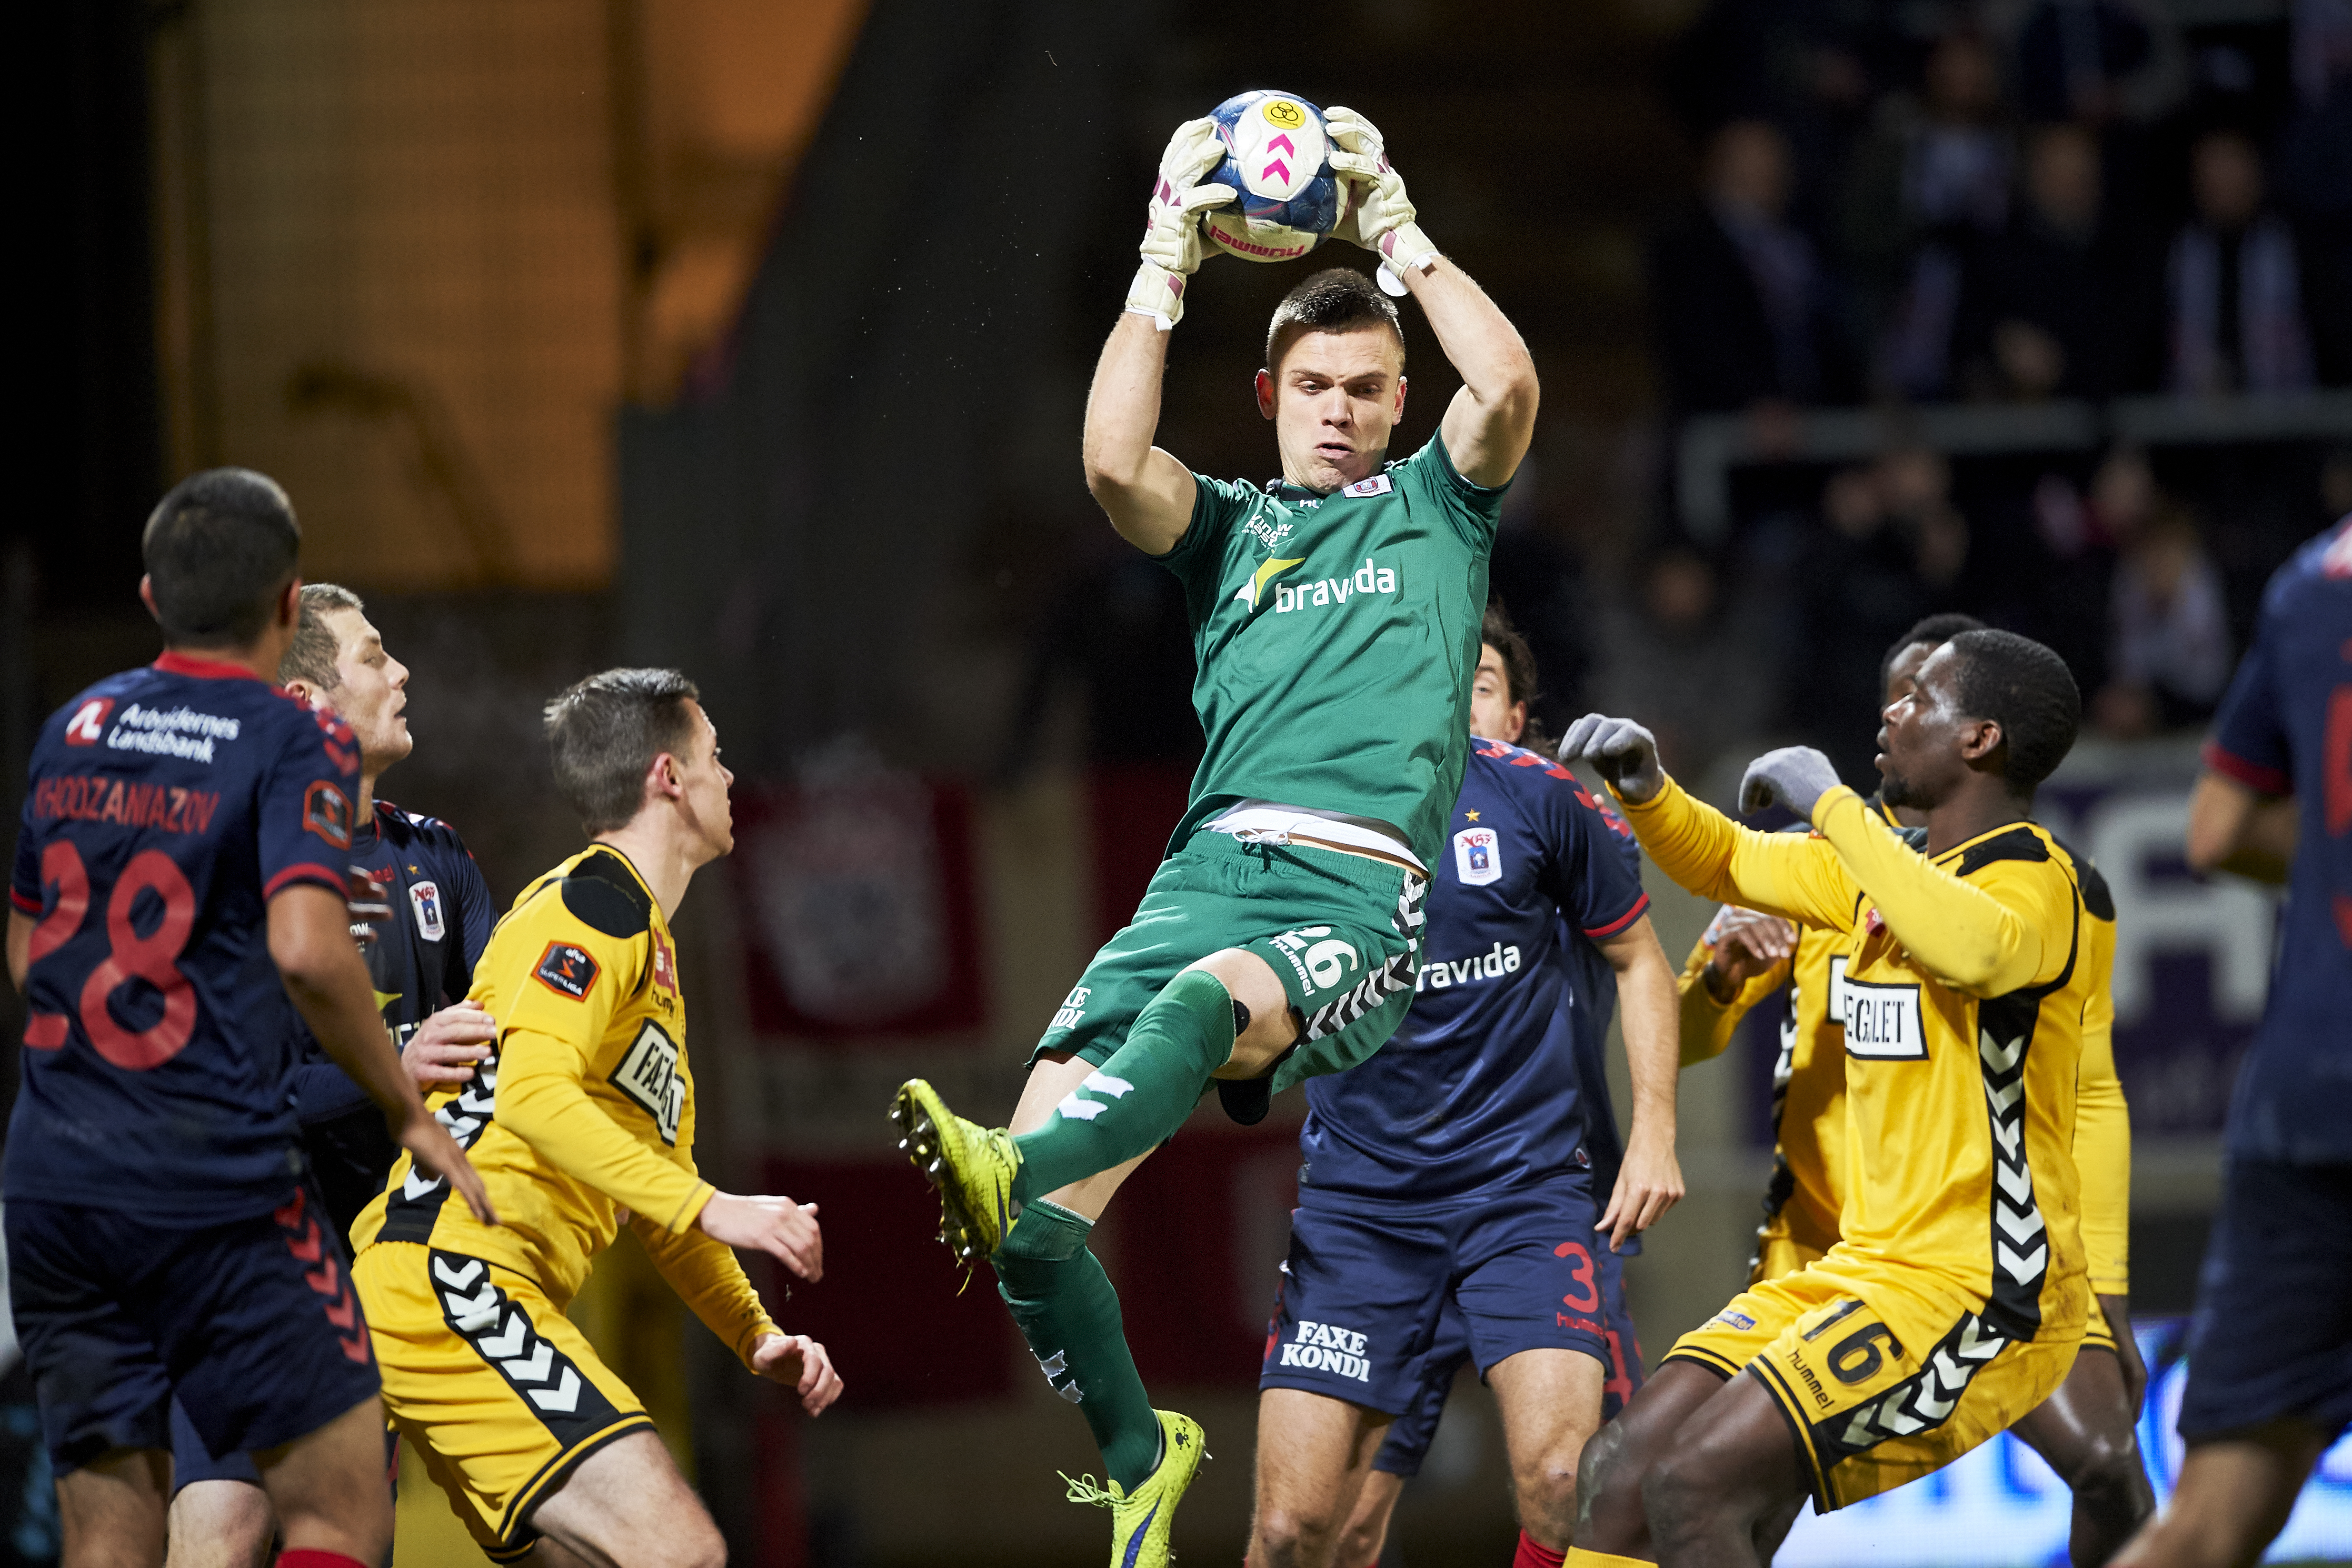 58793036 - 25_11_2016 - Superliga_ Horsens - AGF (1-5) - BONNERUP CLAUS.jpg